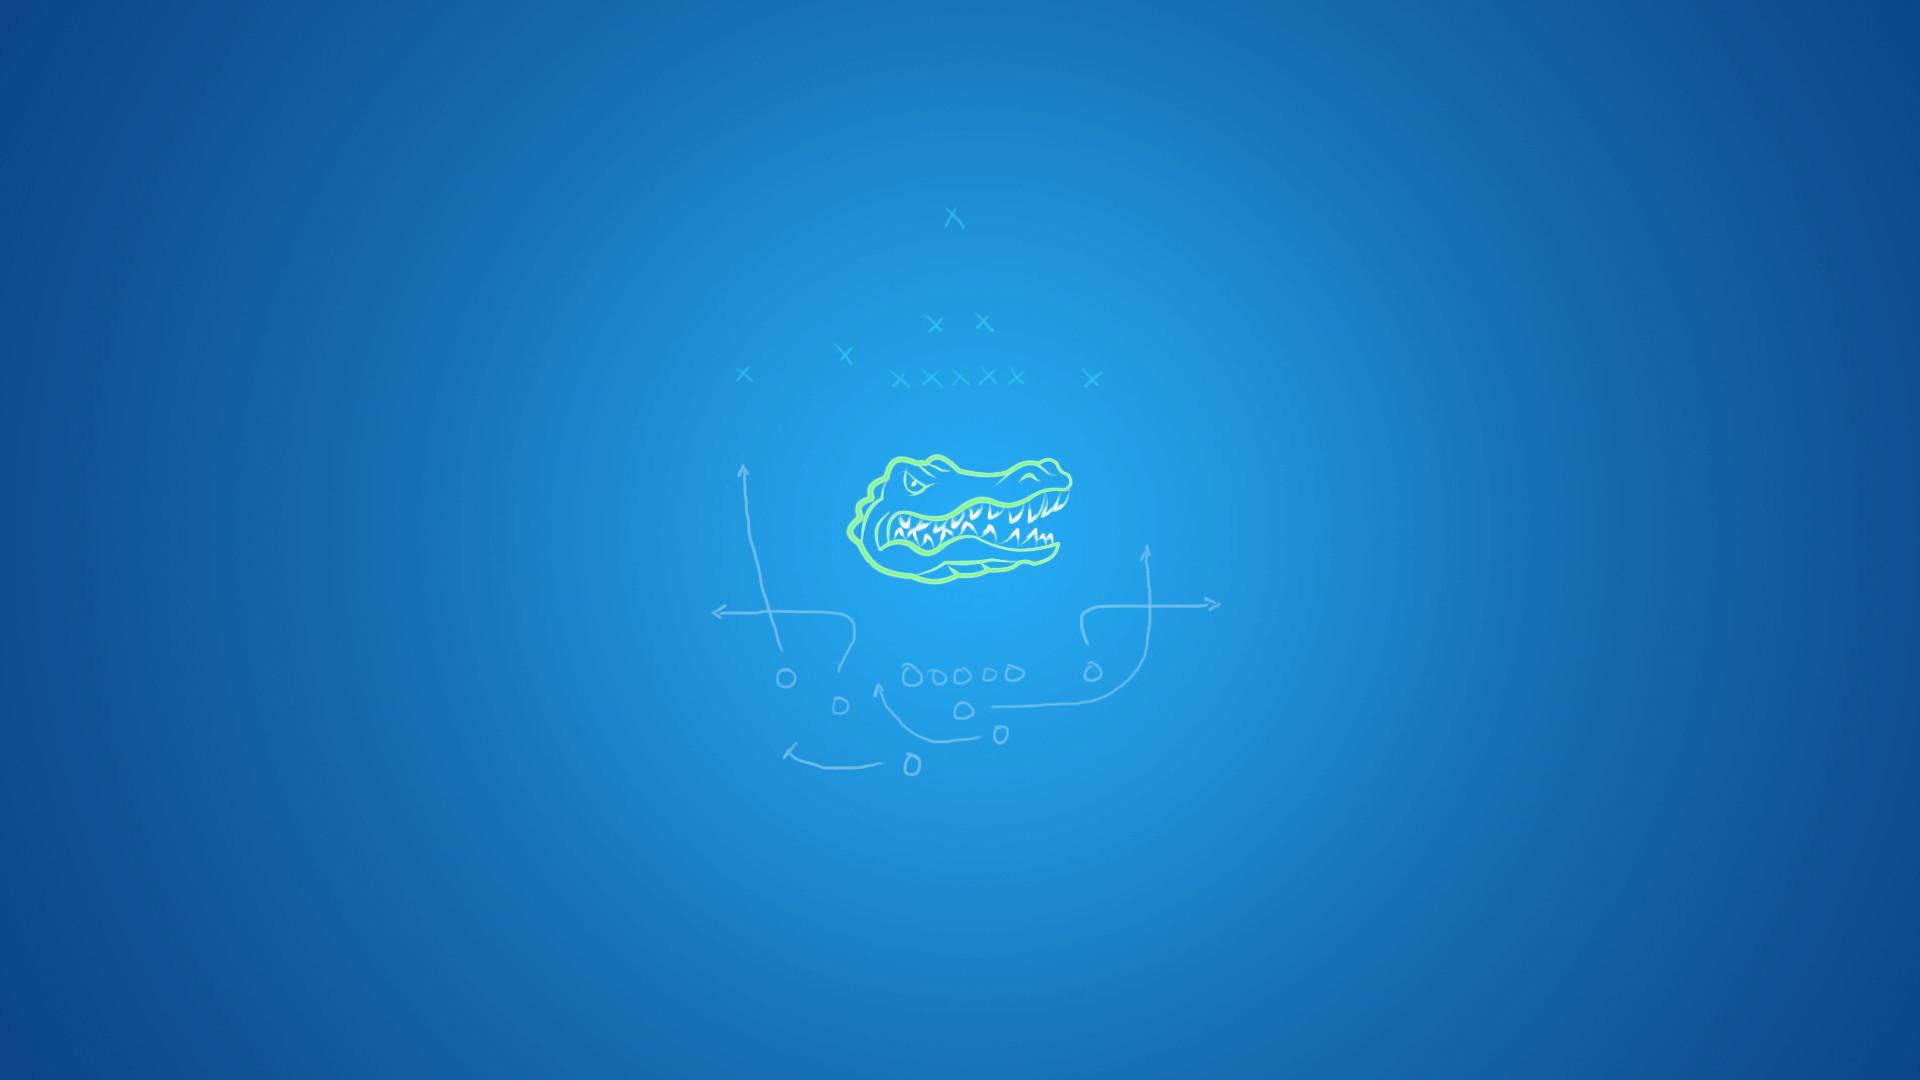 Florida Gators Wallpaper Hd Florida gators + clean by